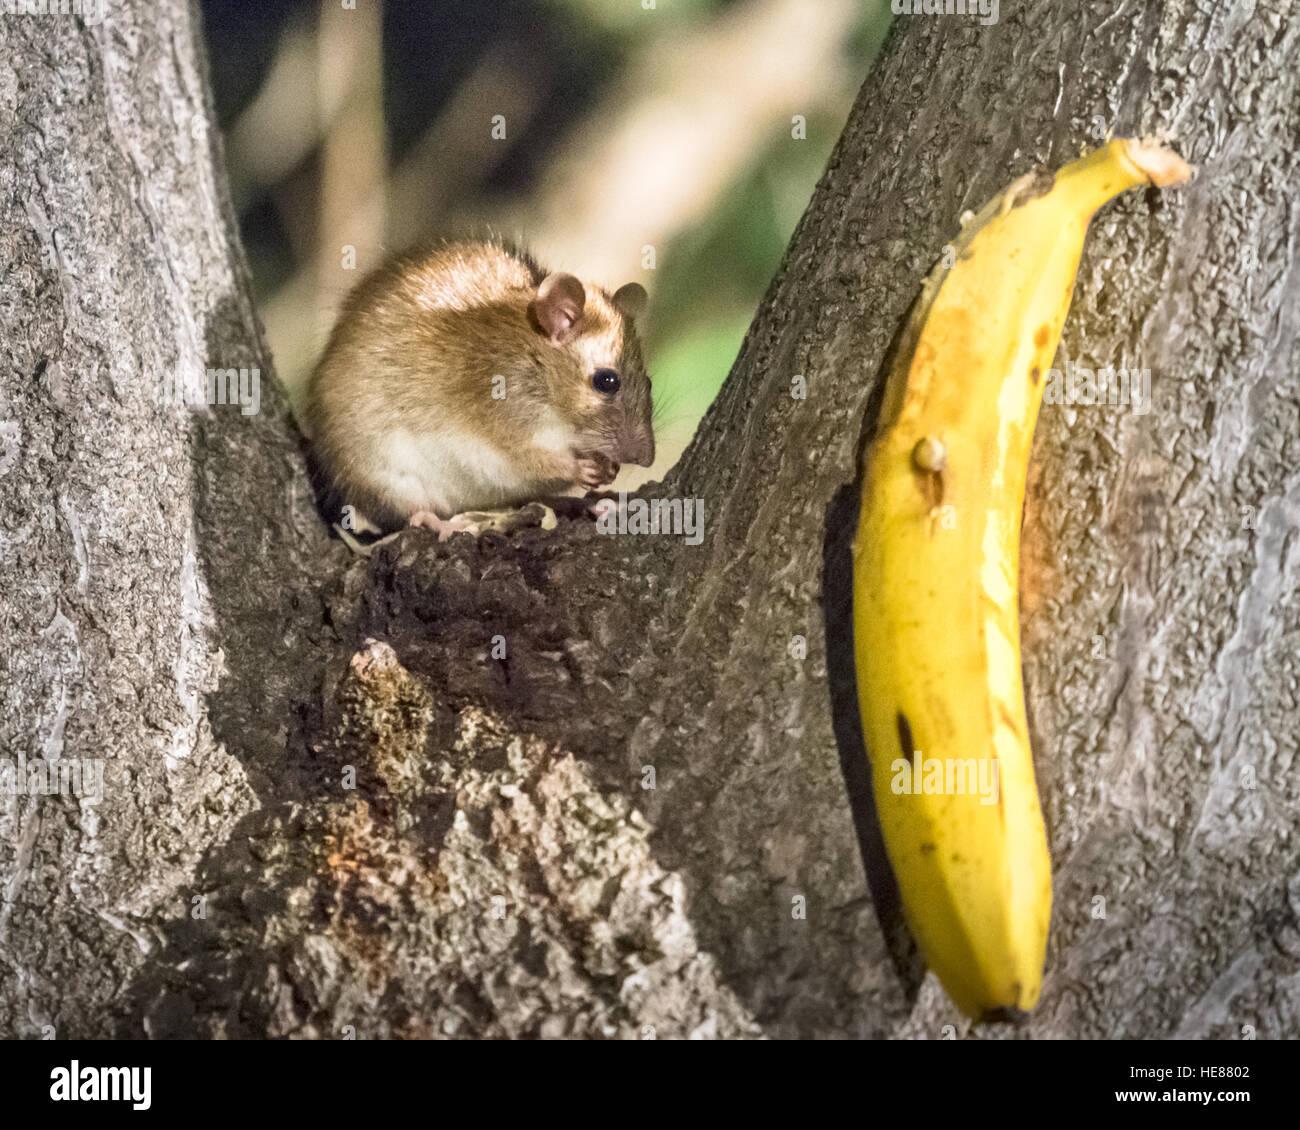 Marsupial Mouse Stock Photos & Marsupial Mouse Stock